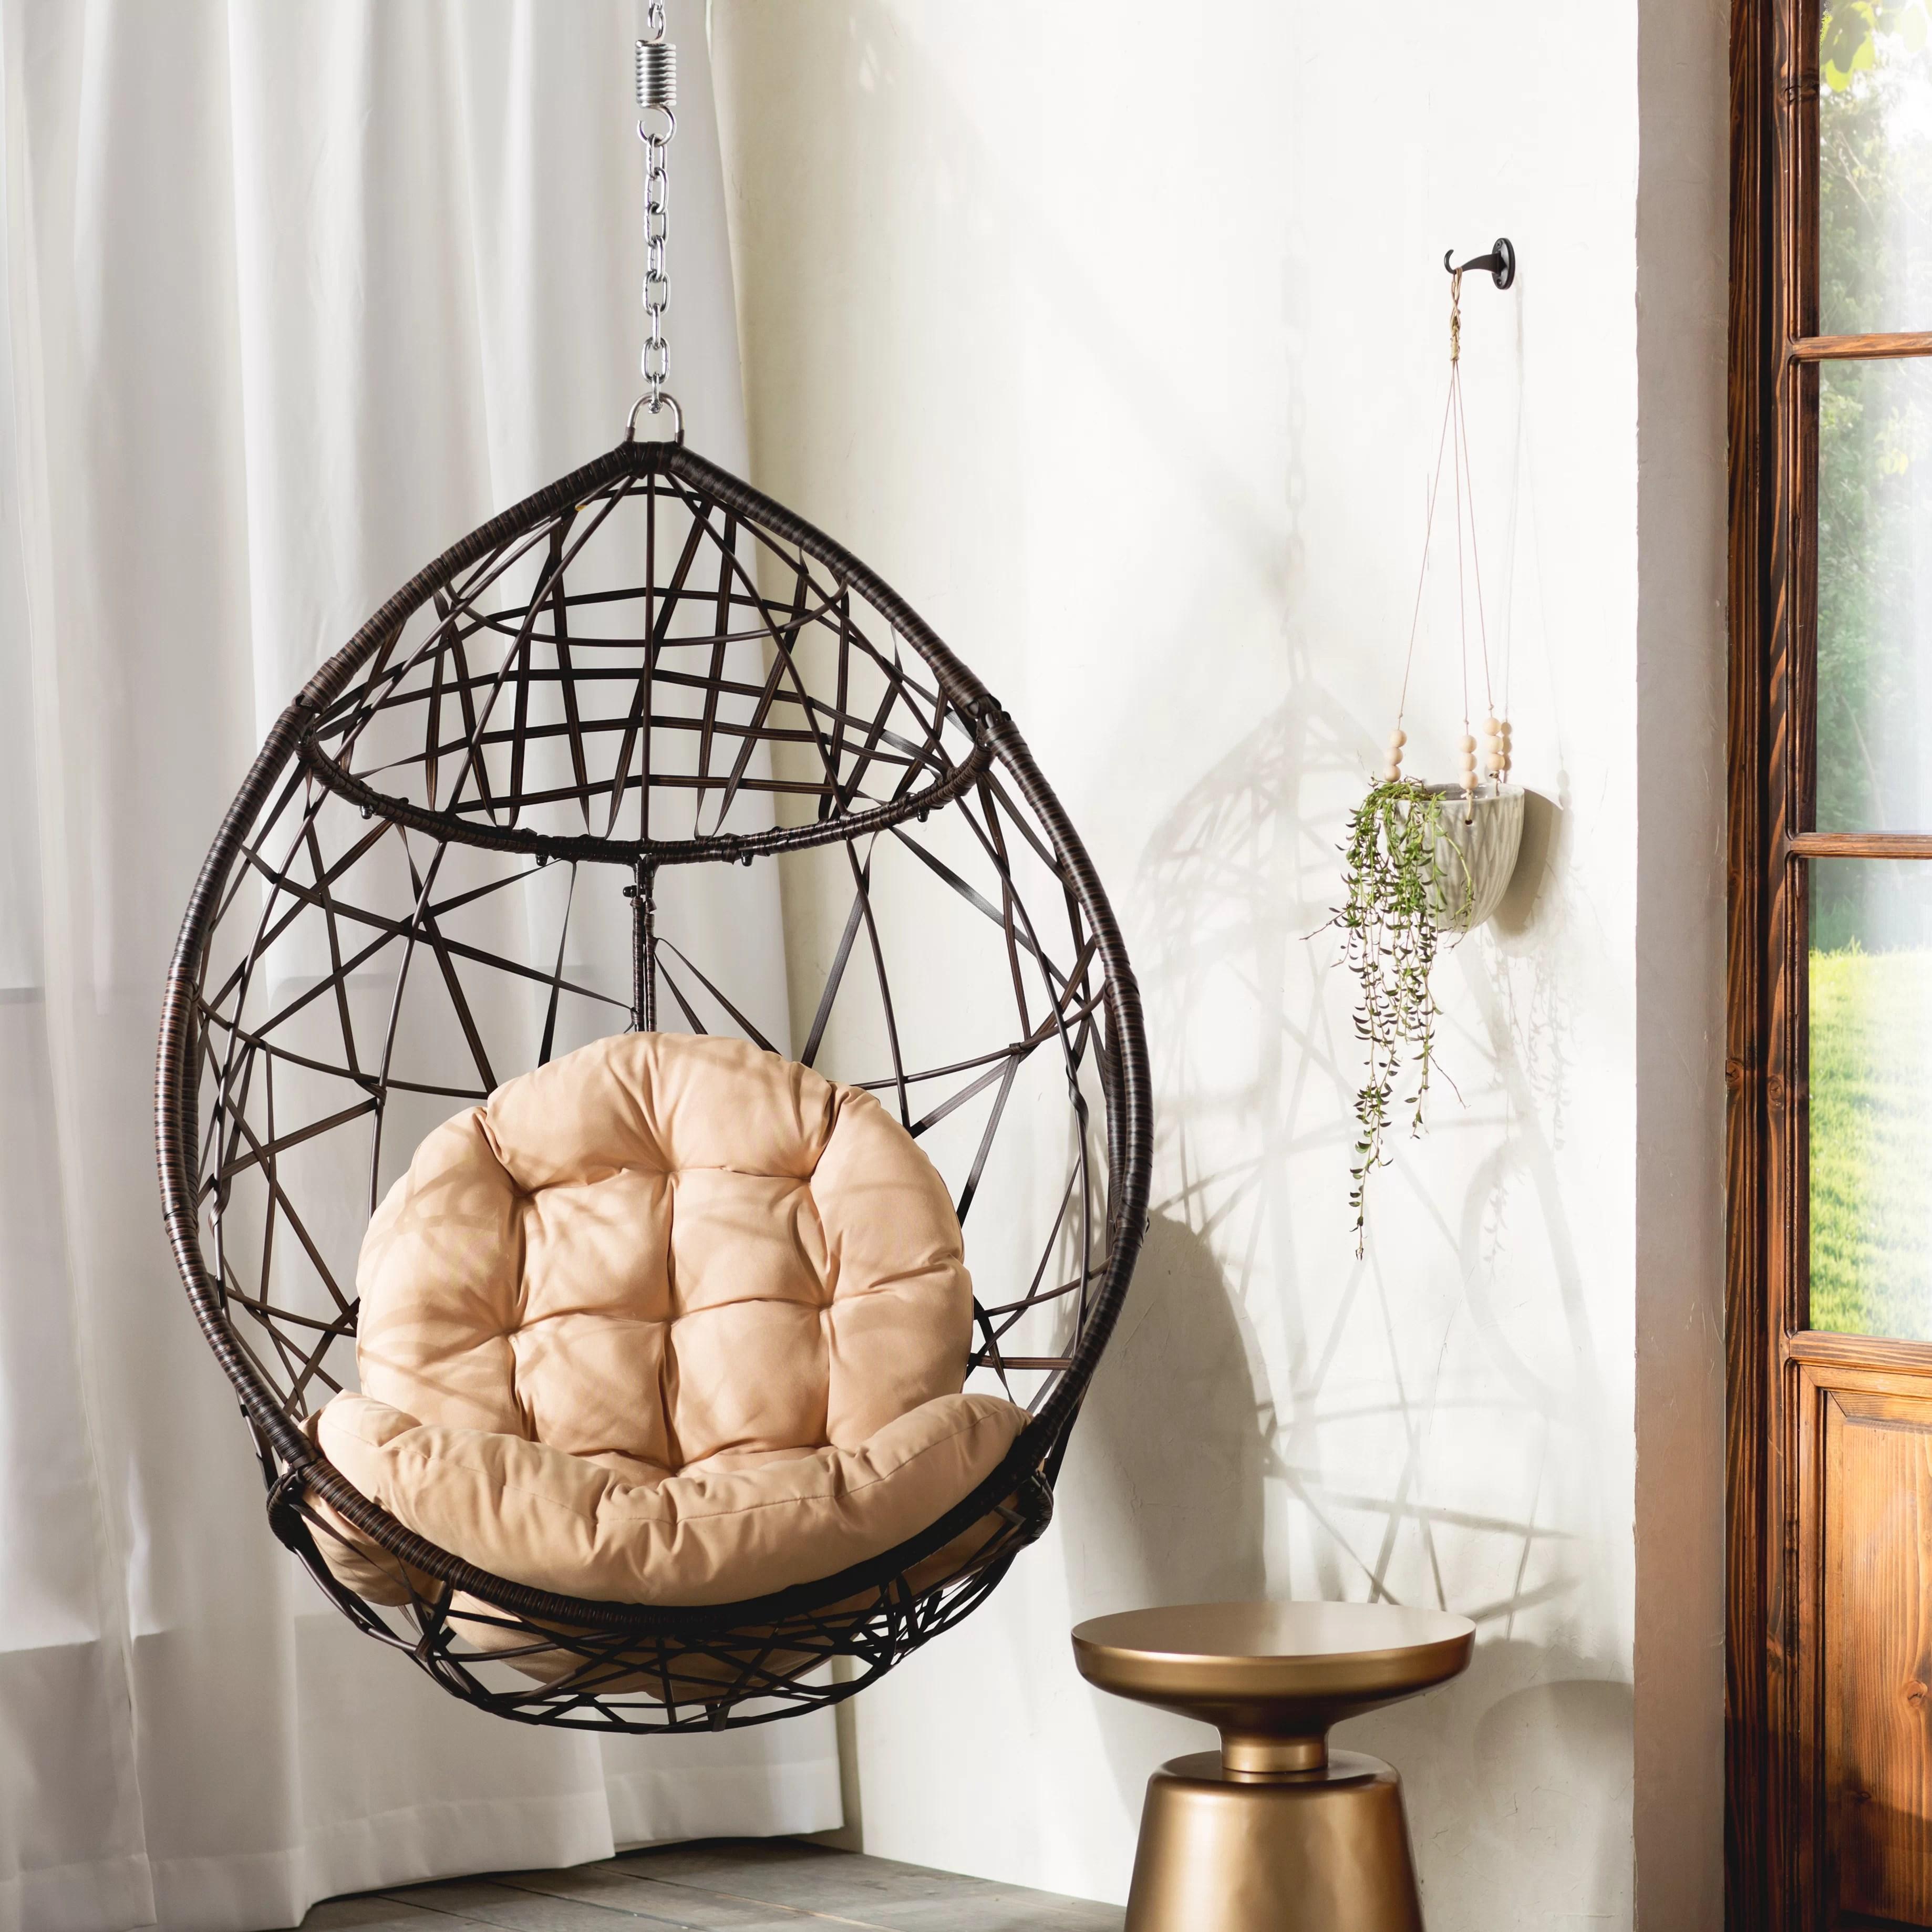 teardrop swing chair leather recliner modern mistana destiny tear drop pvc with stand wayfair